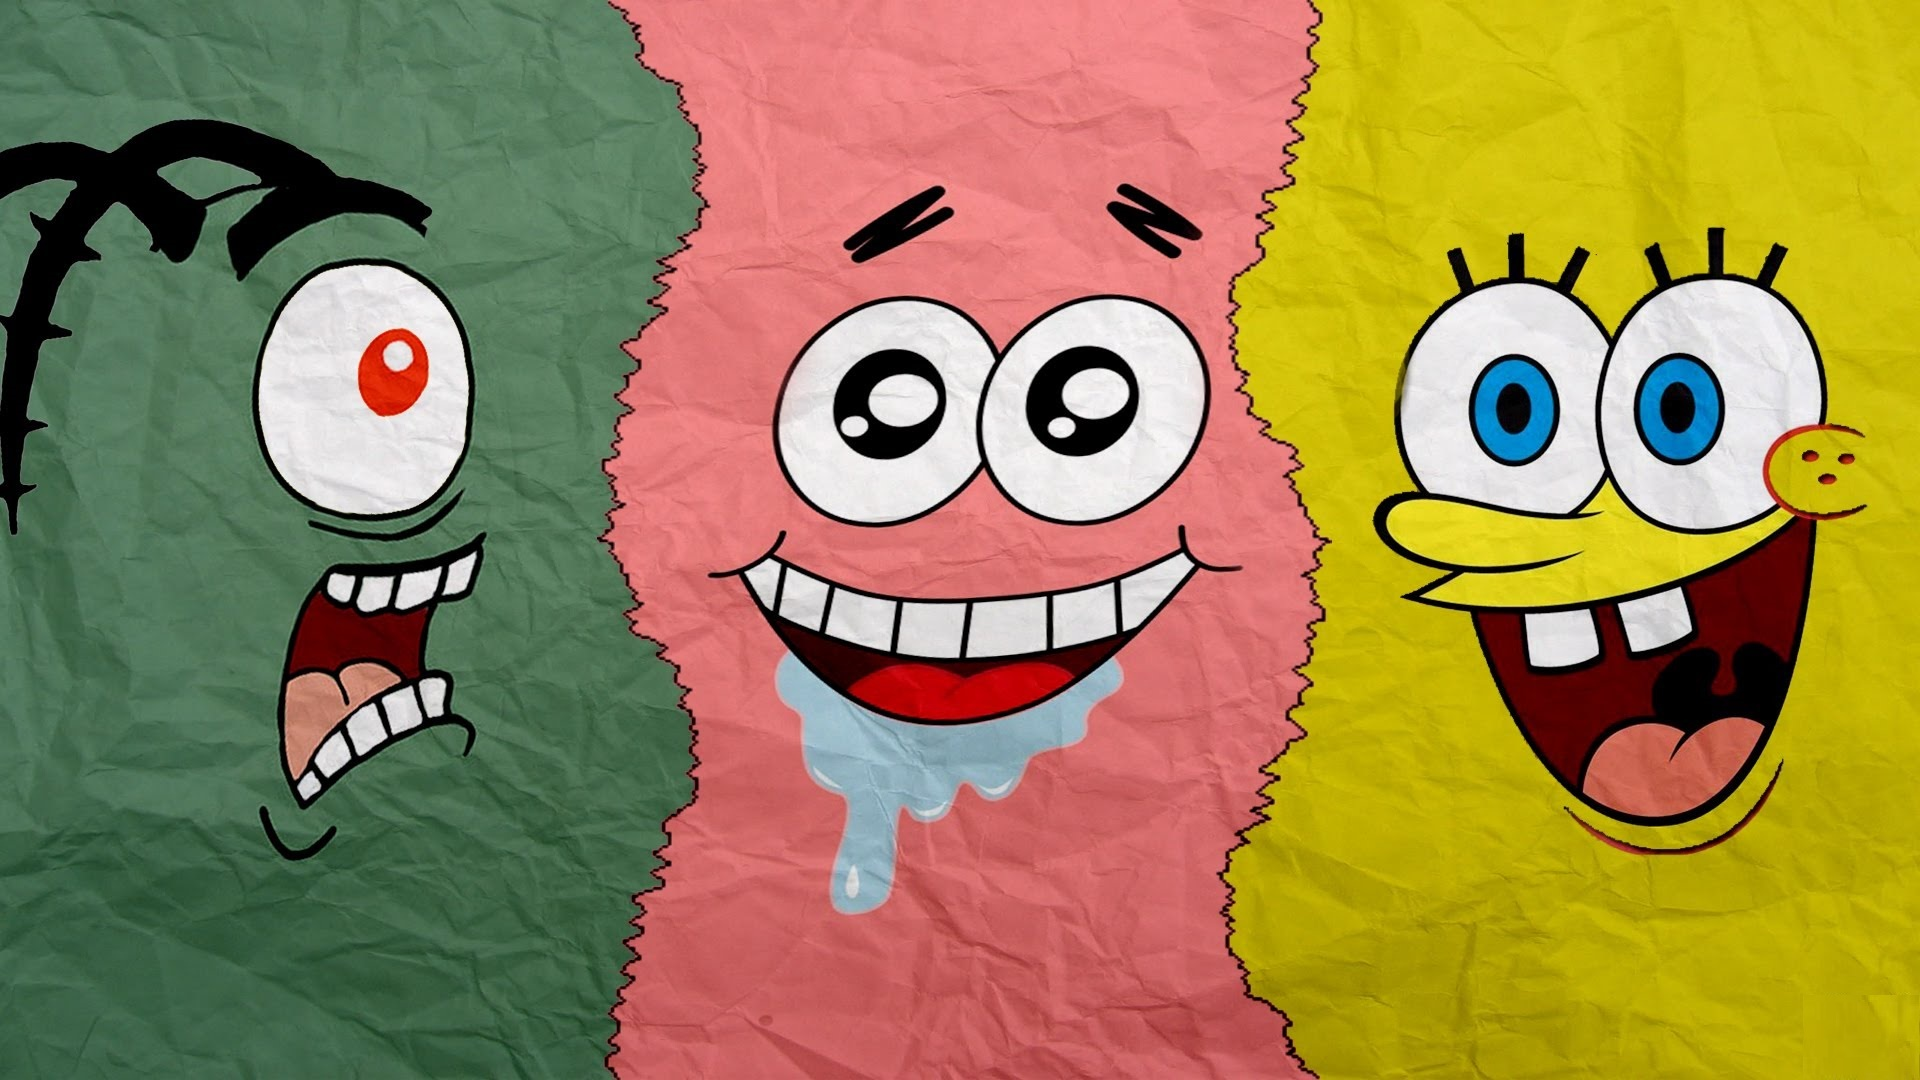 plankton patrick spongebob wallpaper 66734